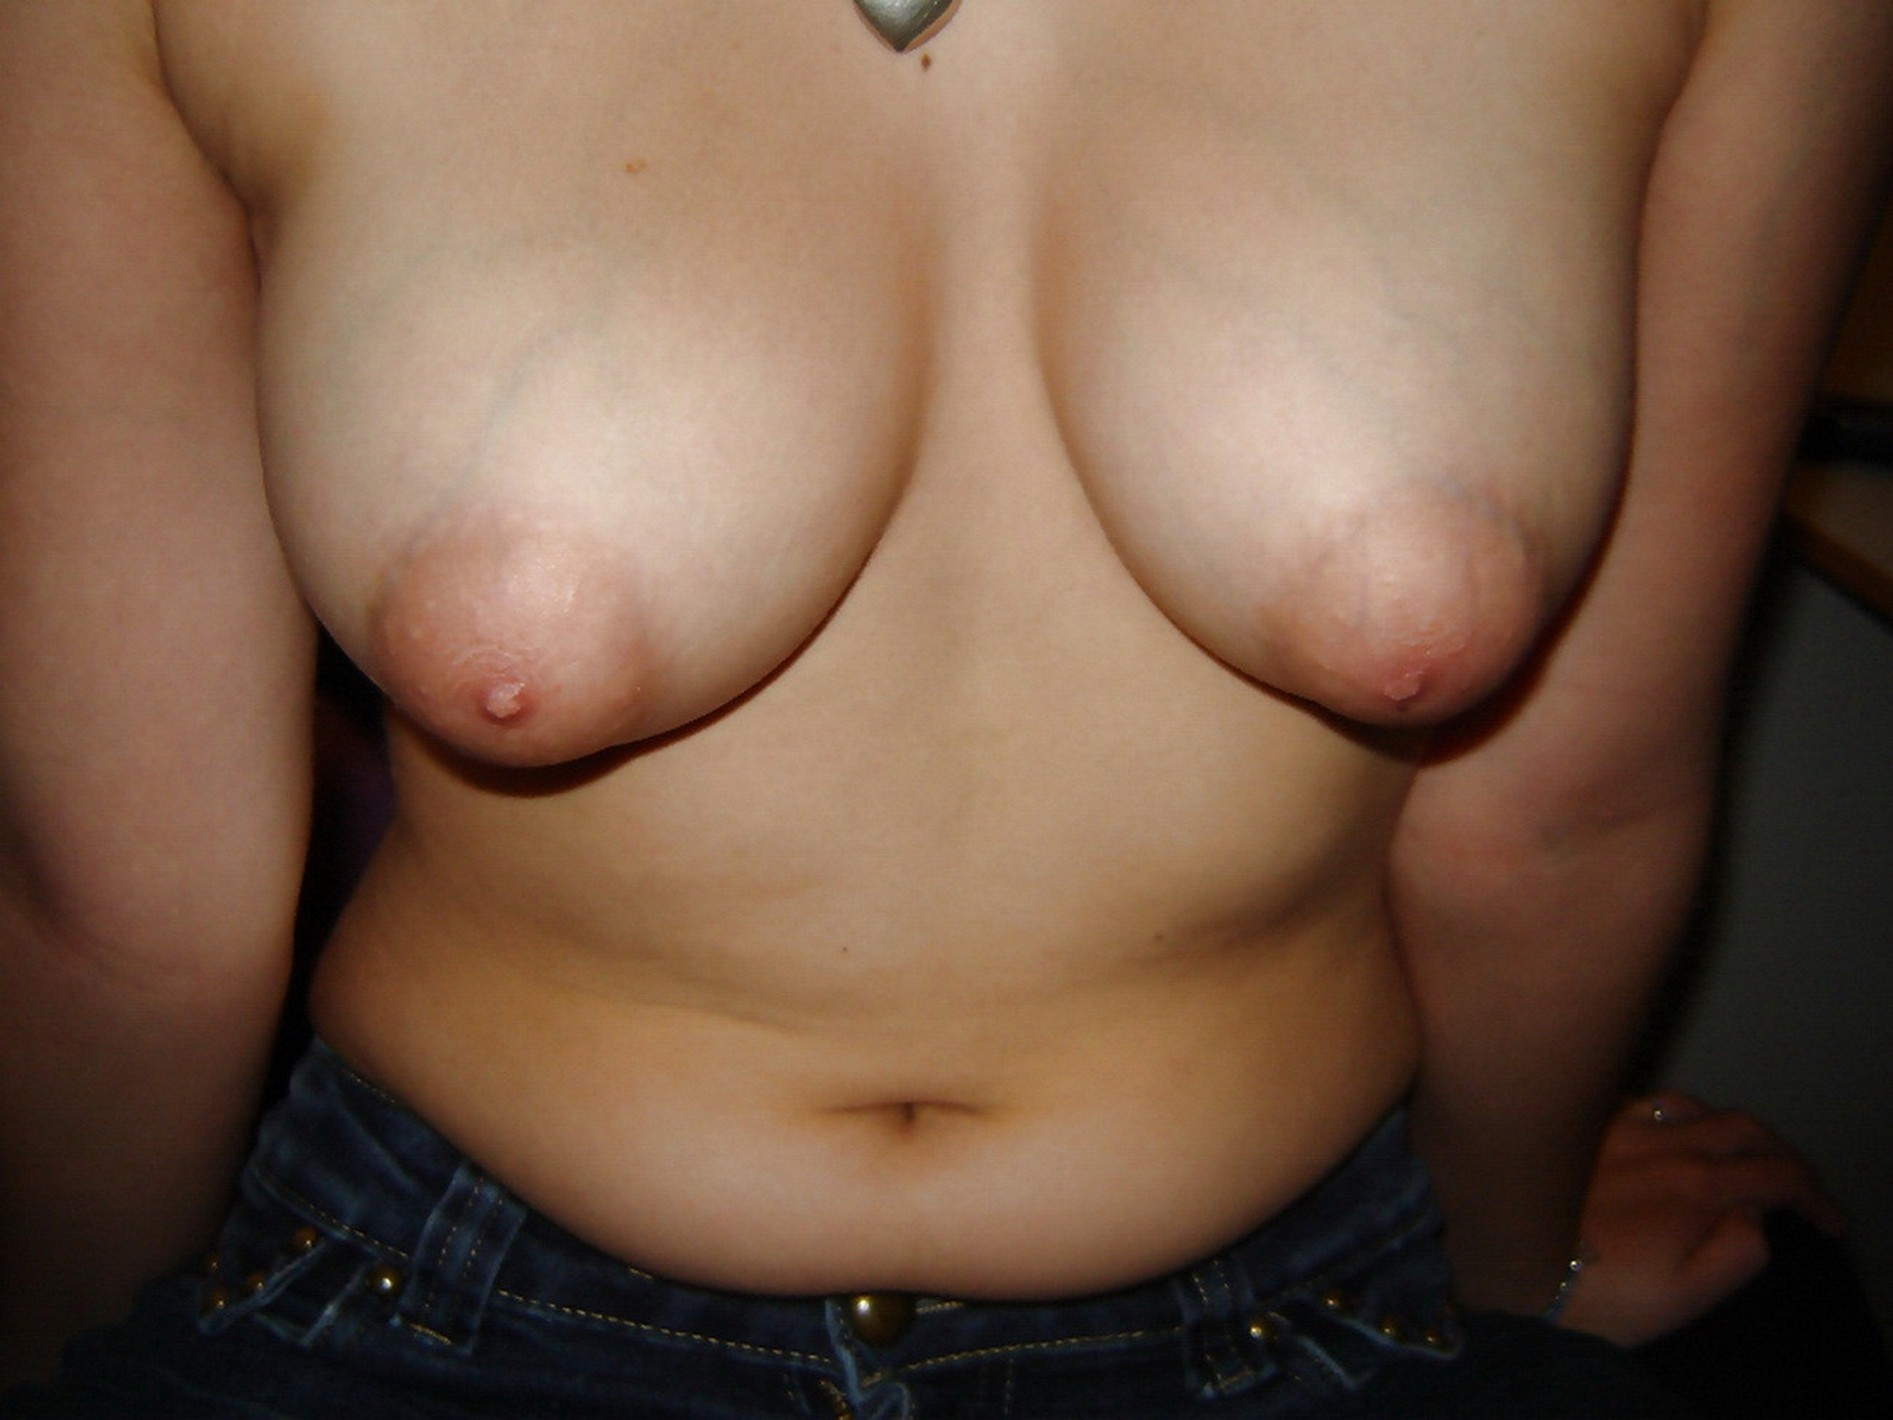 Порно груди домашнее с набухшими сосками фото